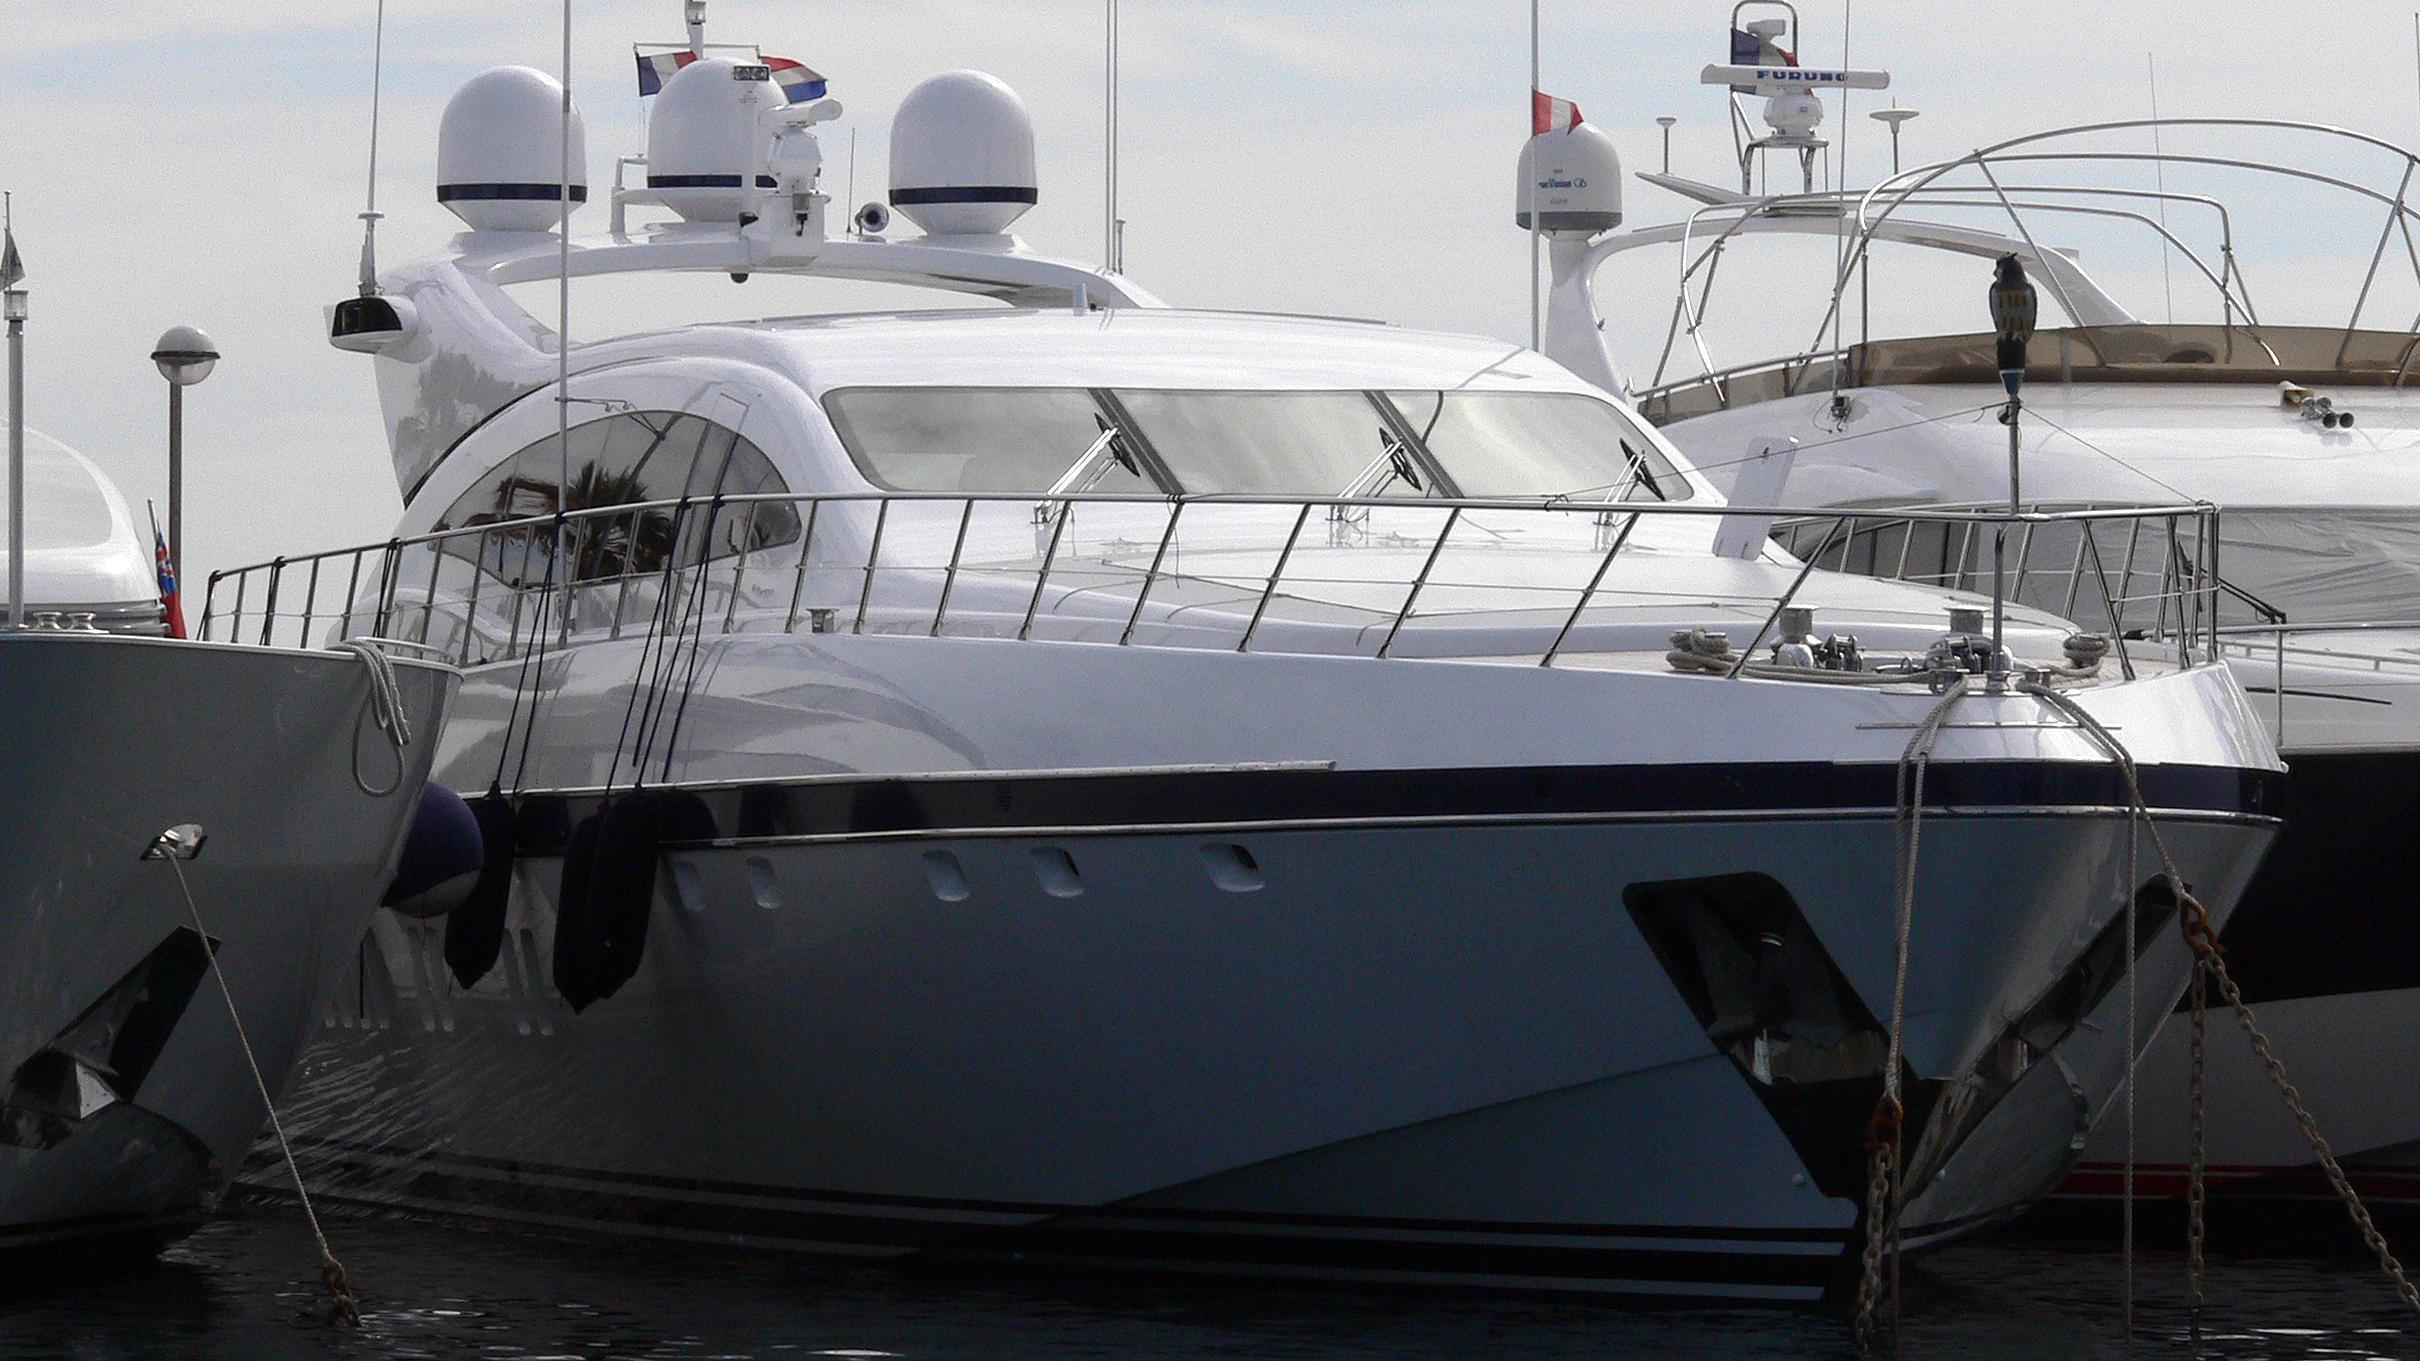 s-o'-motor-yacht-overmarine-mangusta-108-sport-2007-33m-bow-moored